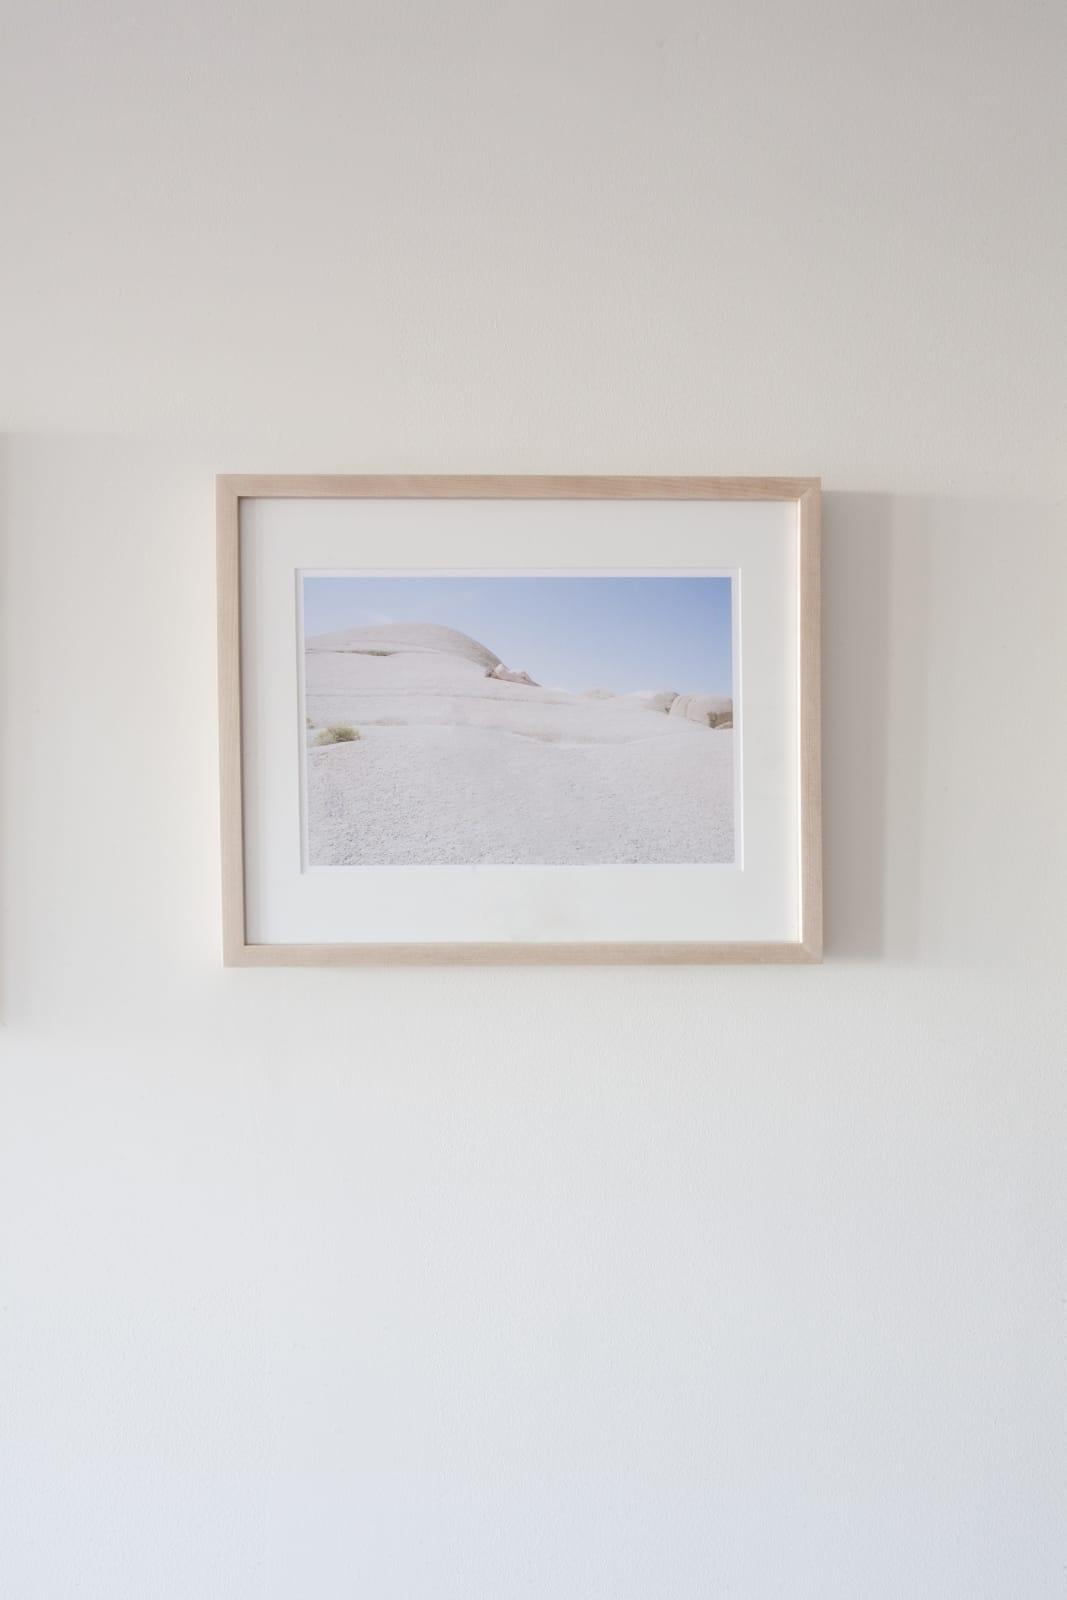 Grace Clark Jumbo Rocks II, 2017 digital pigment print print size 10 x 15 inches, 16 x 20 framed, edition 1/10 $ 650.00